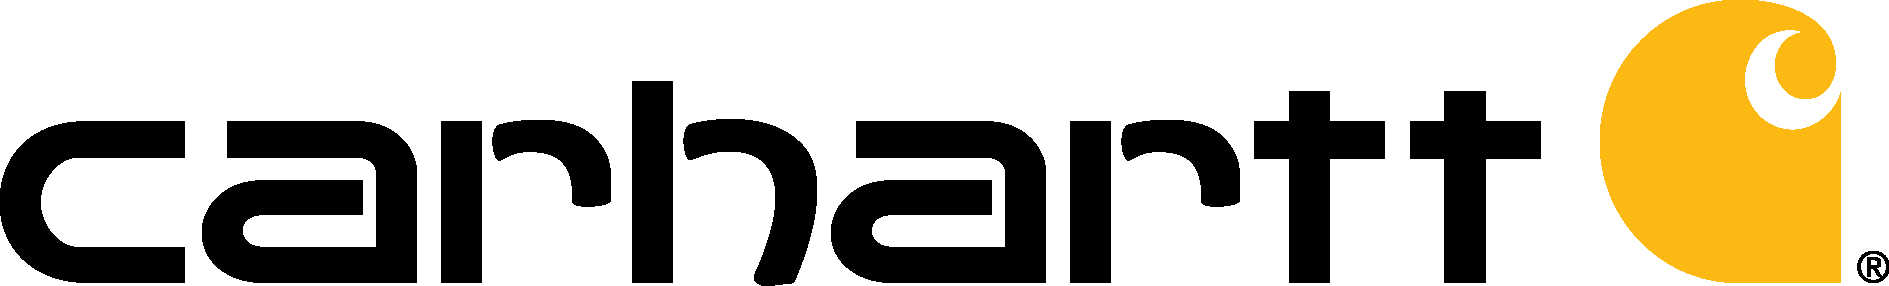 Carhartt Logo png